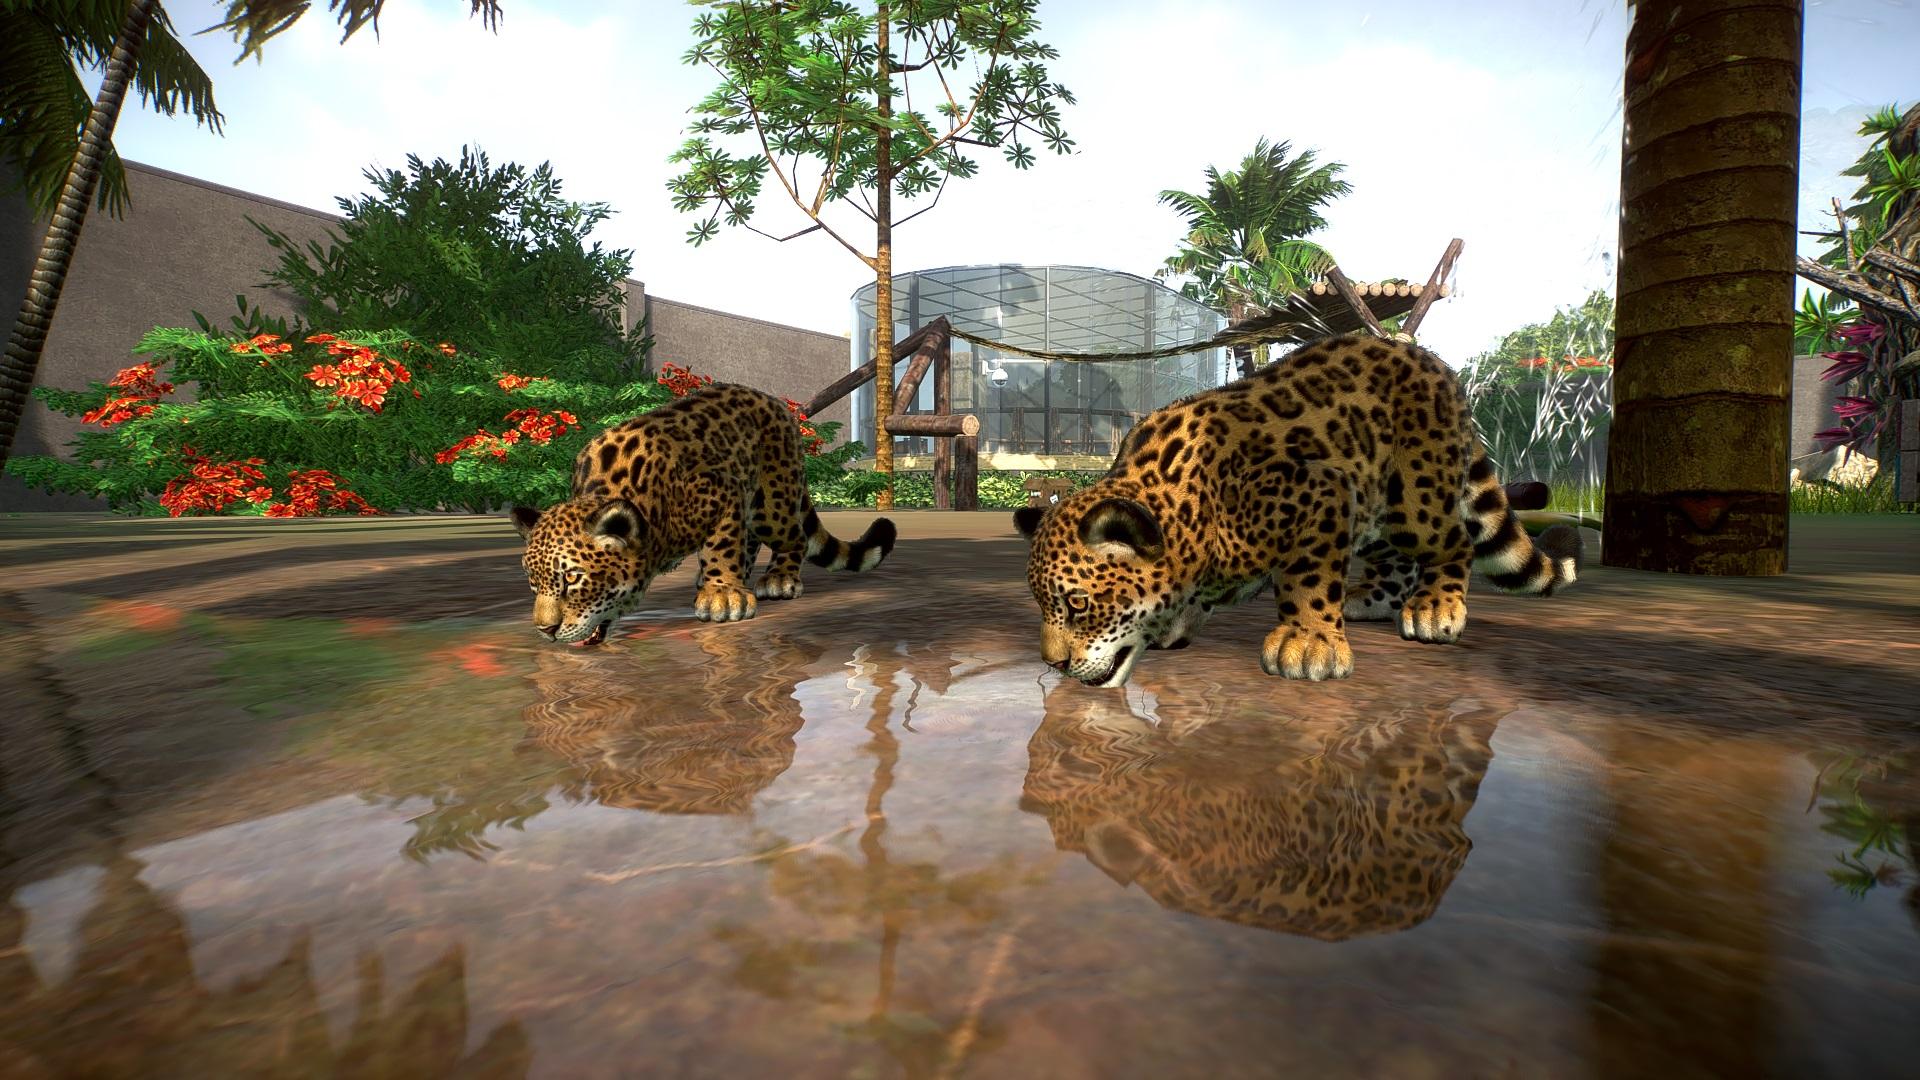 Planet Zoo Screenshot 2020.04.10 - 18.55.59.15.jpg